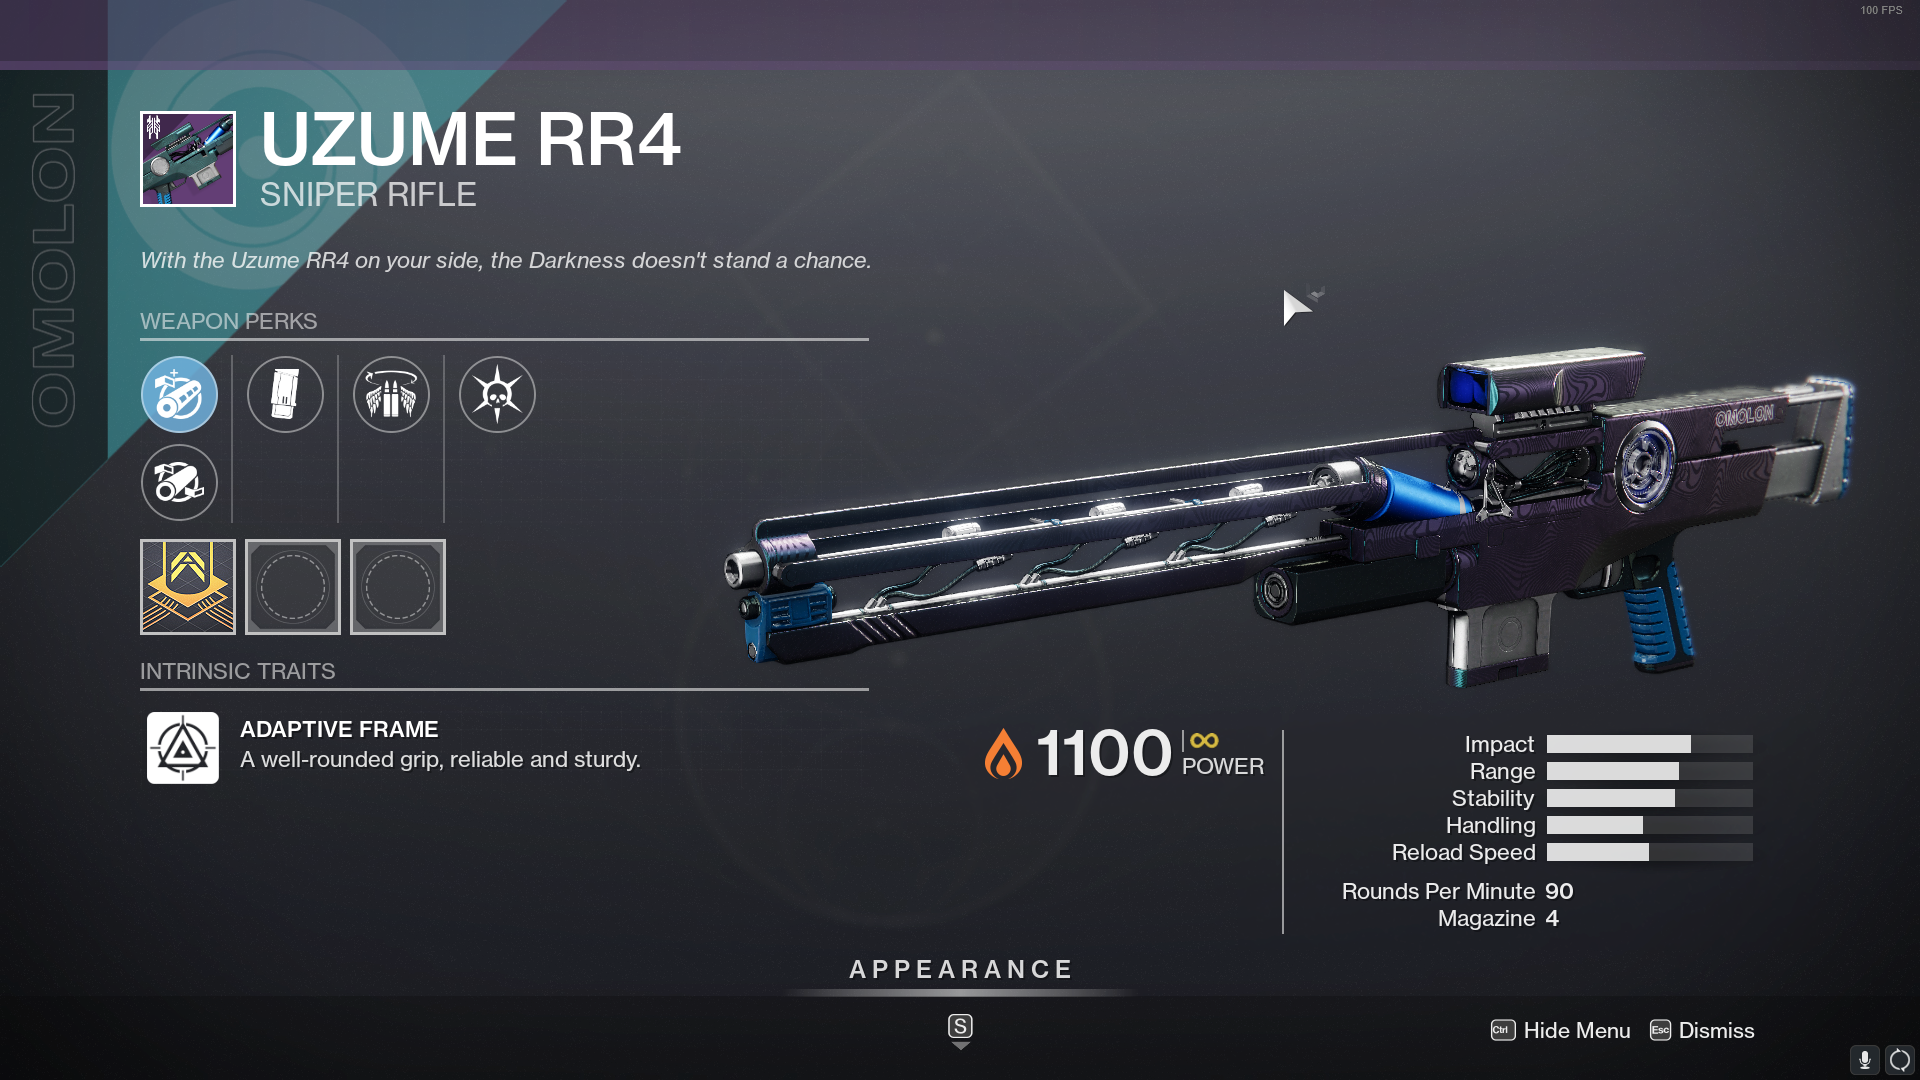 Destiny 2 Uzume RR4 God Roll